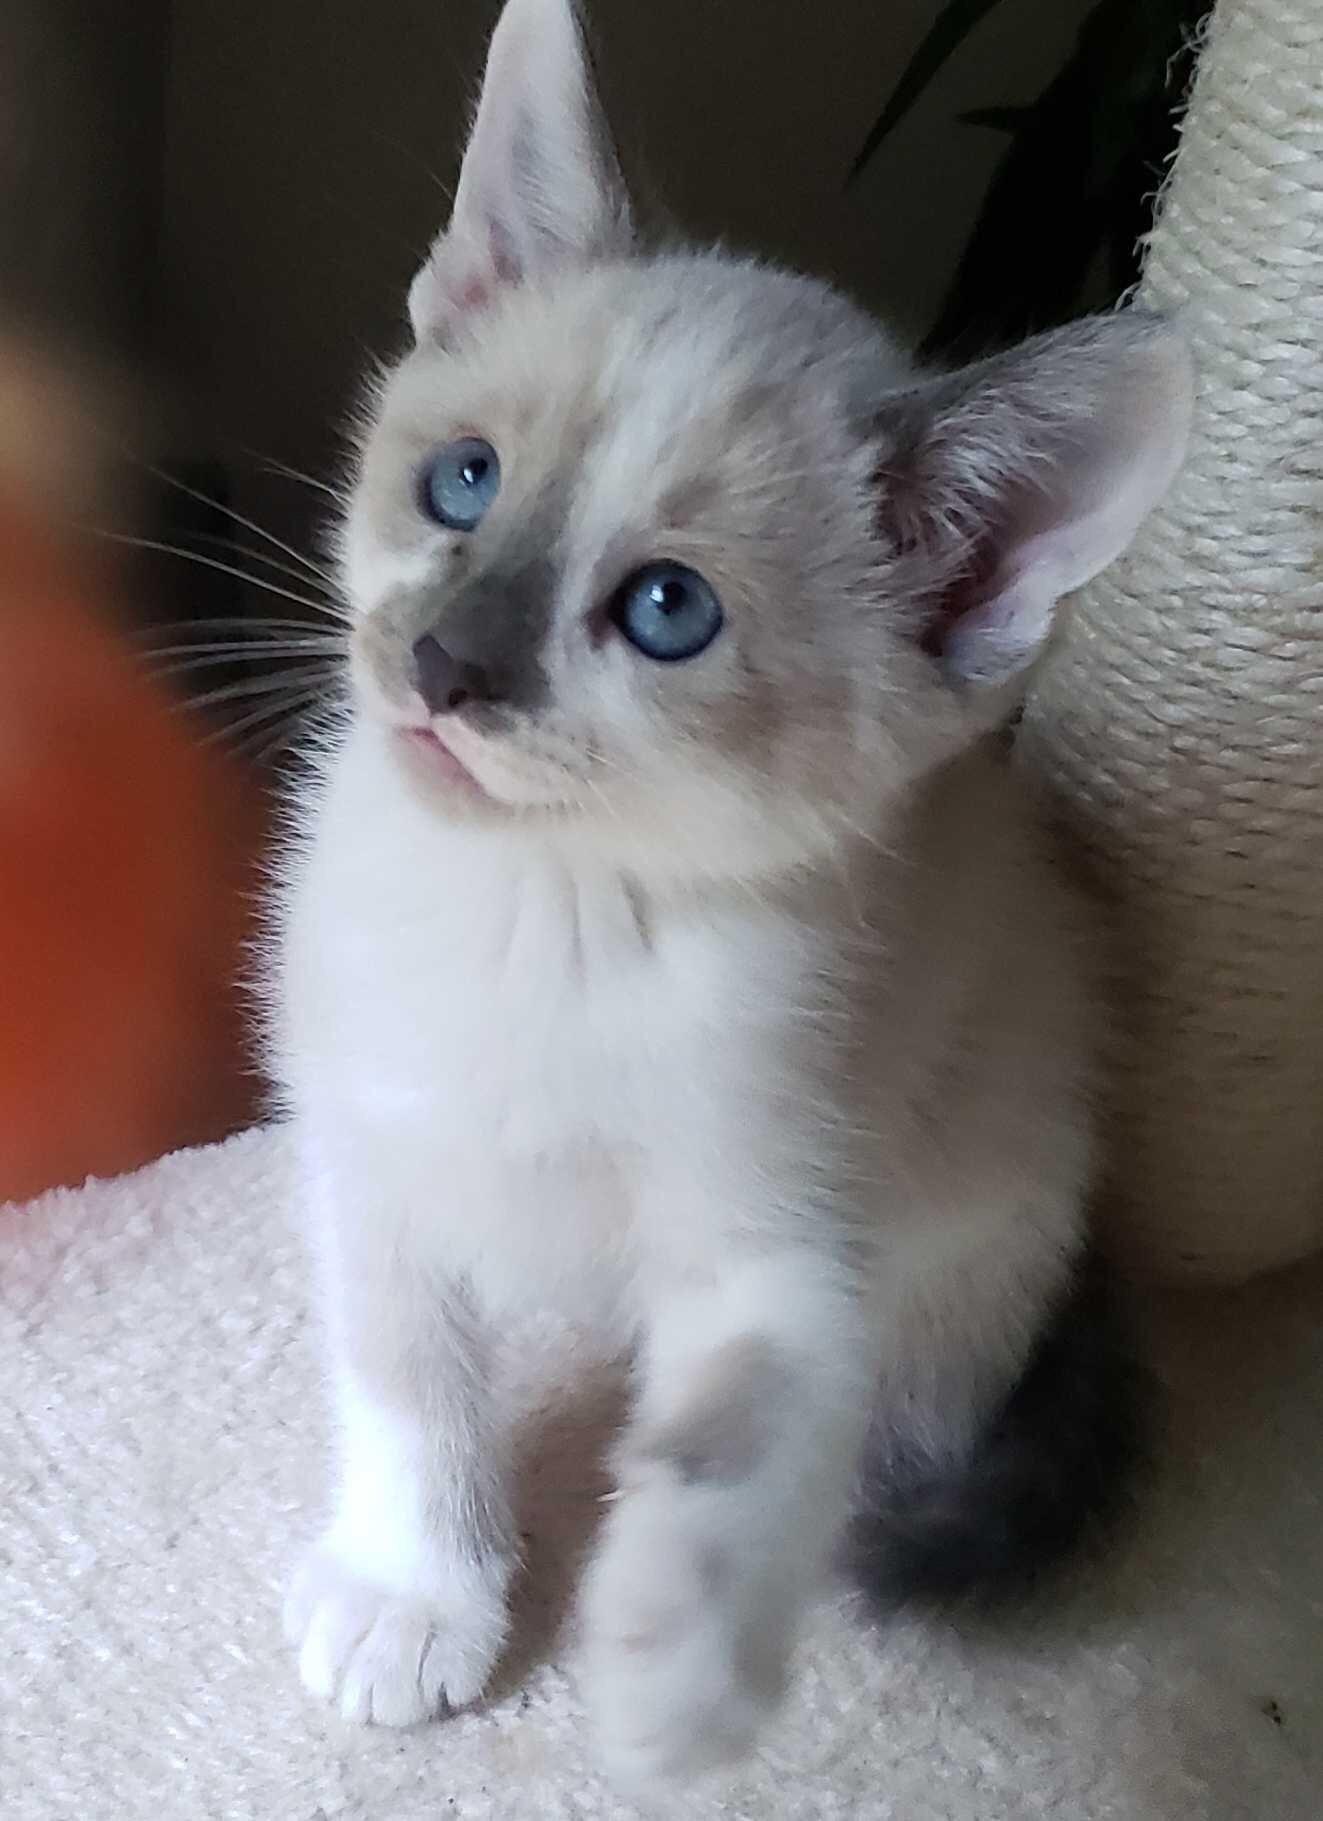 my kitten from Craigslist. 8 weeks old half siamese half